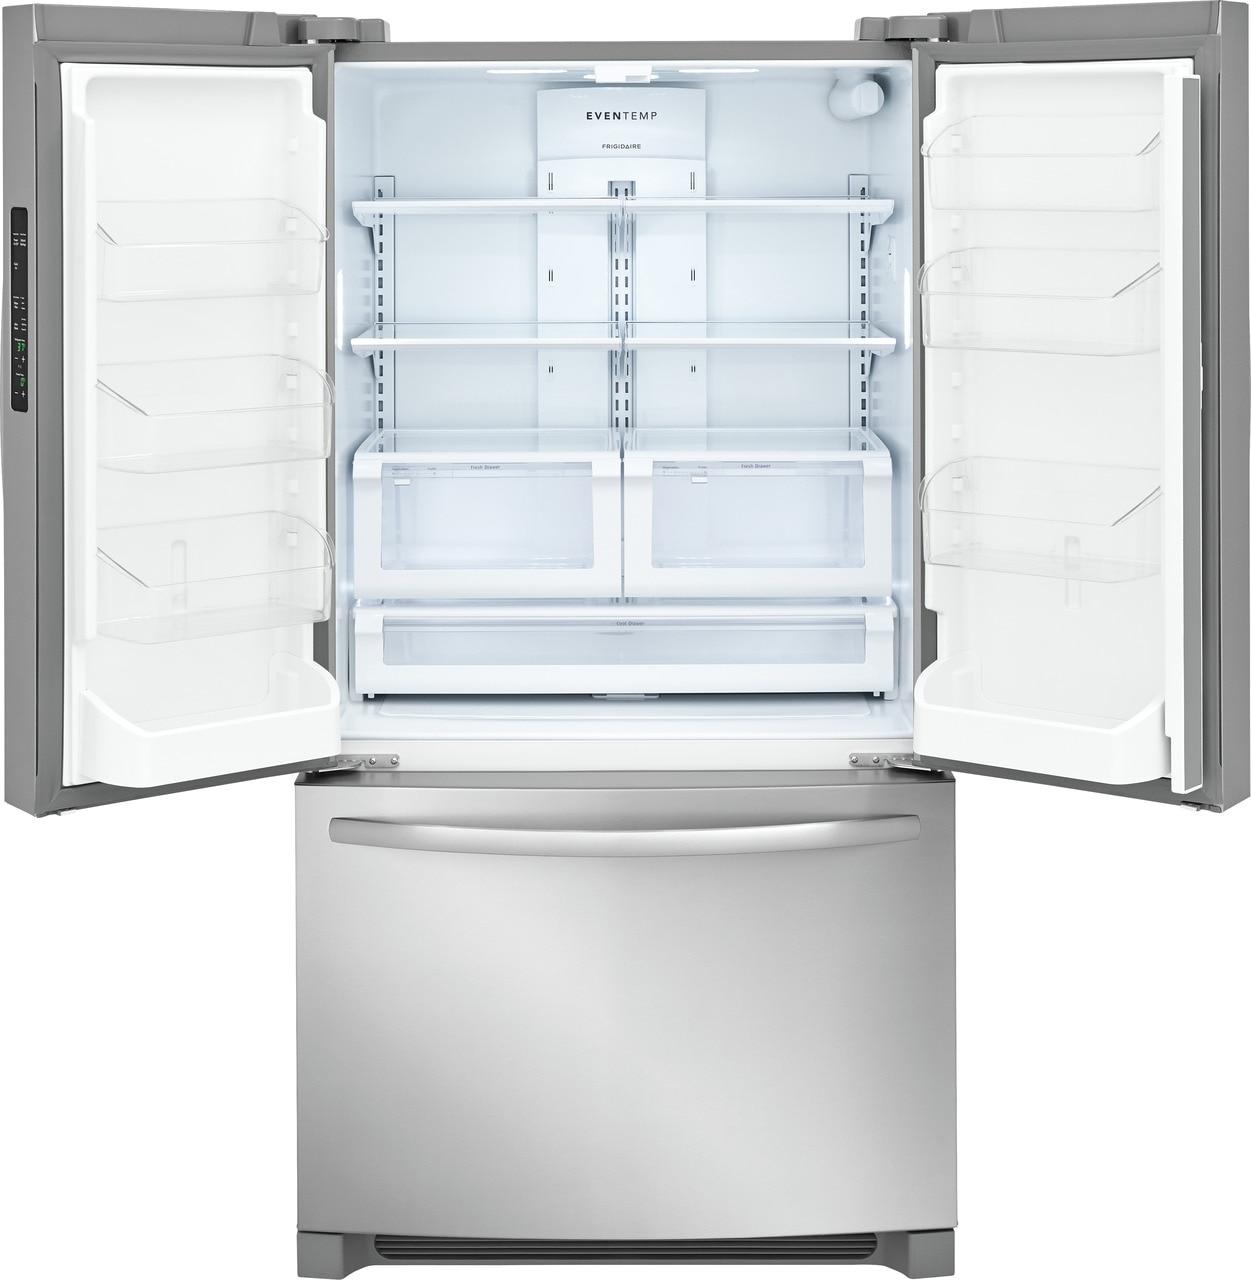 Model: FFHN2750TS | Frigidaire 27.6 Cu. Ft. French Door Refrigerator